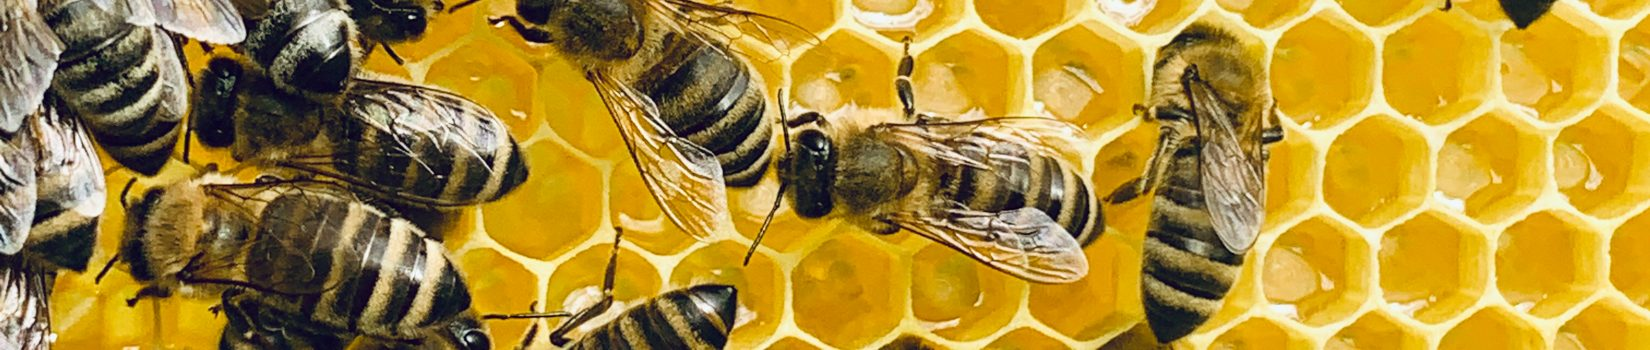 Bienengut Kohlstatt